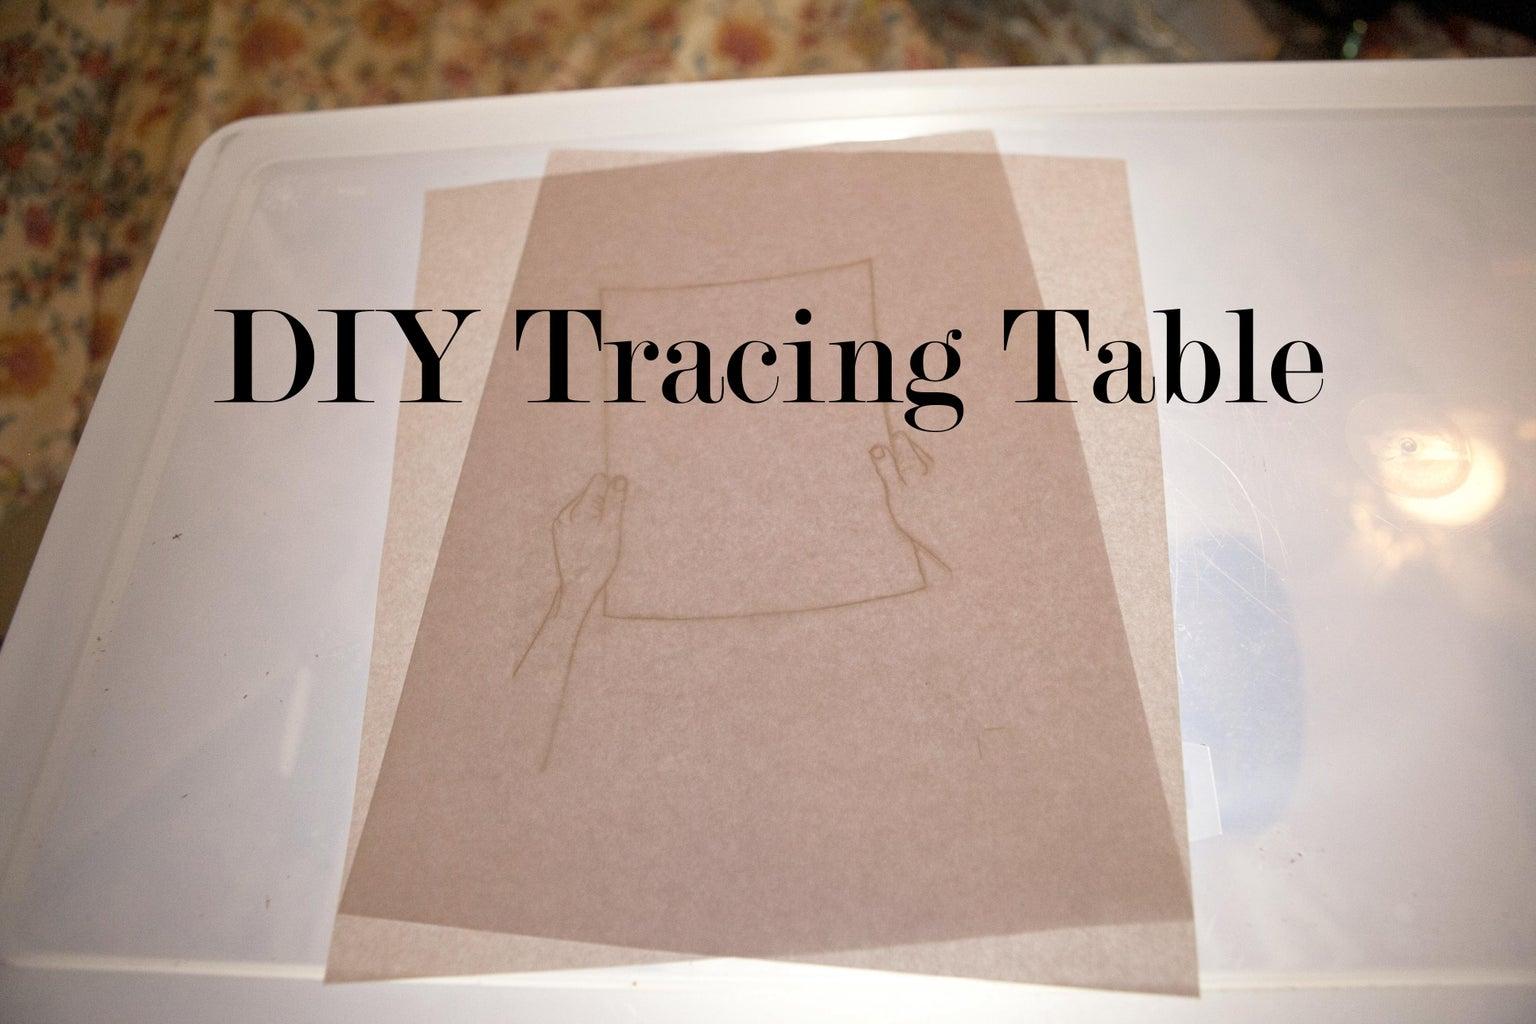 DIY Tracing Table